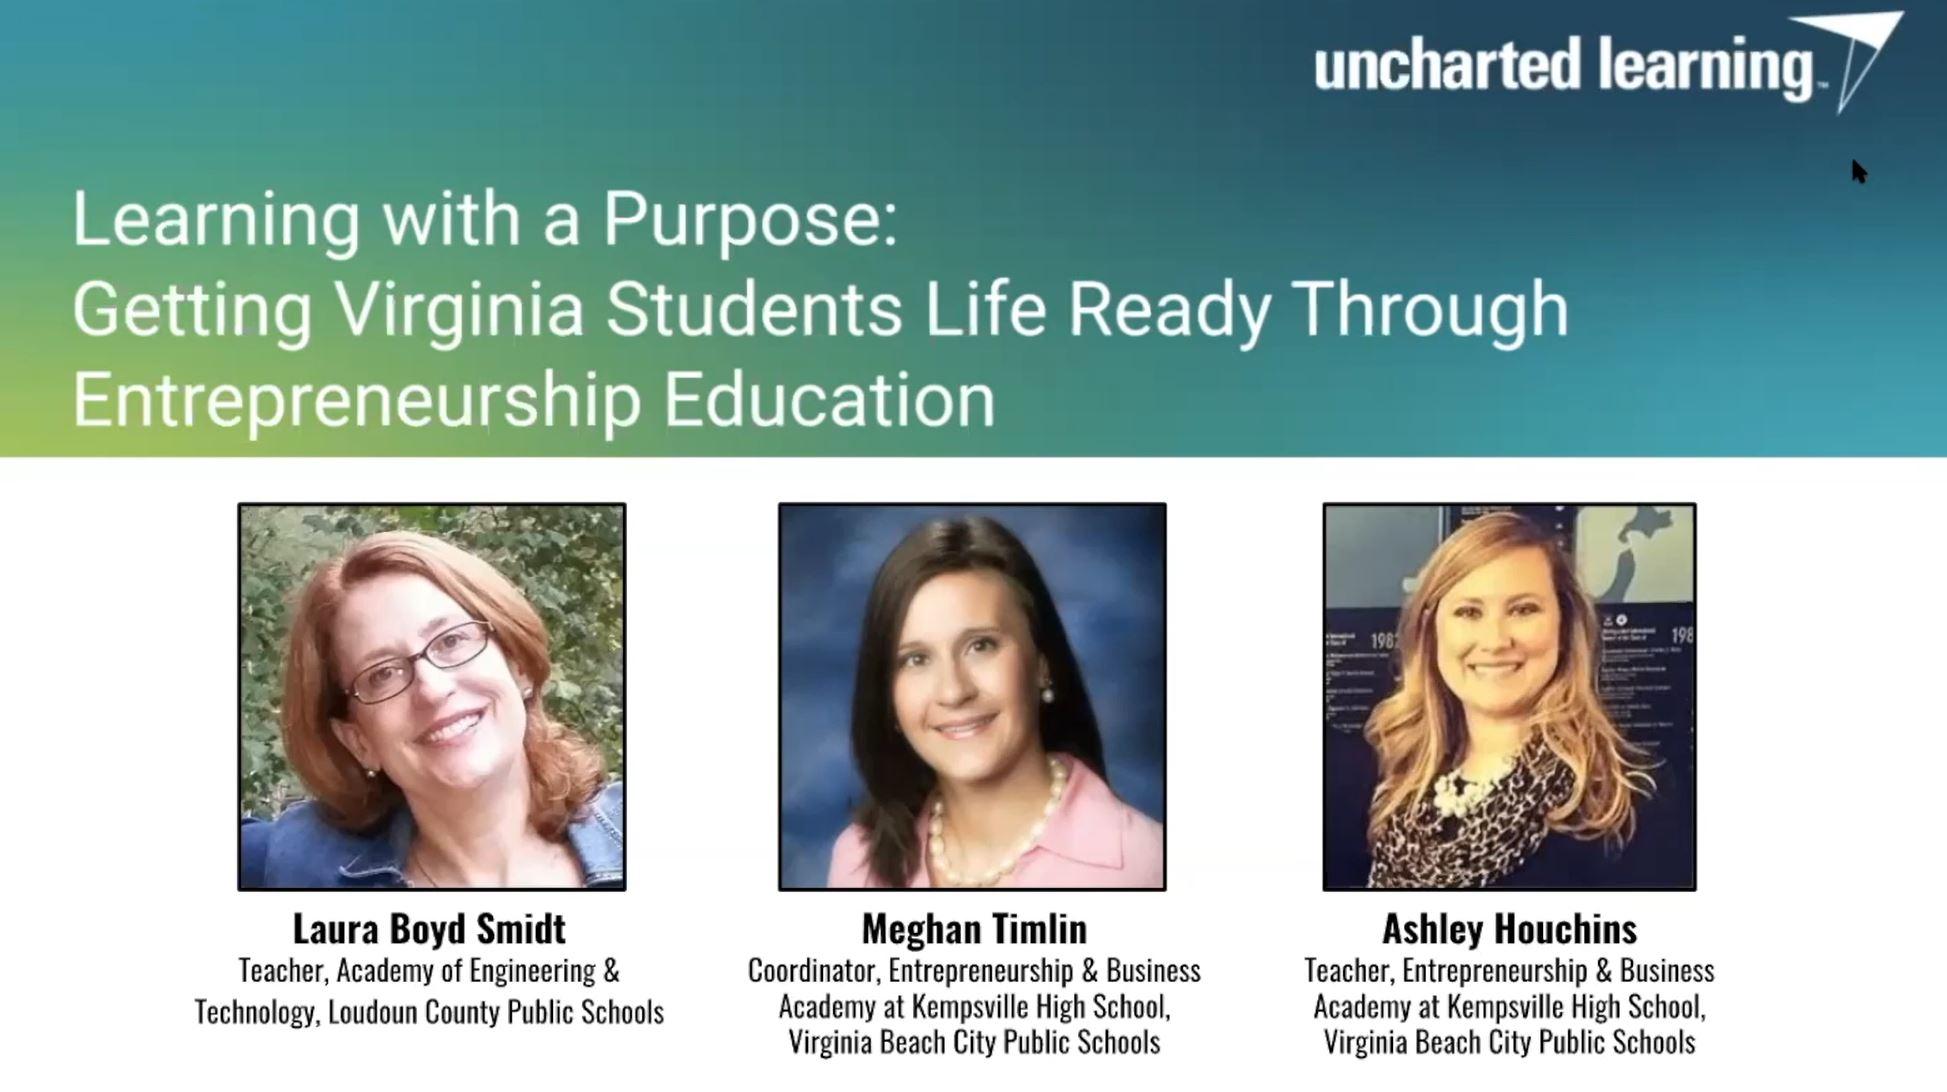 [WEBINAR] Learning with a Purpose: Getting Virginia Students 'Life Ready' Through Entrepreneurship Education